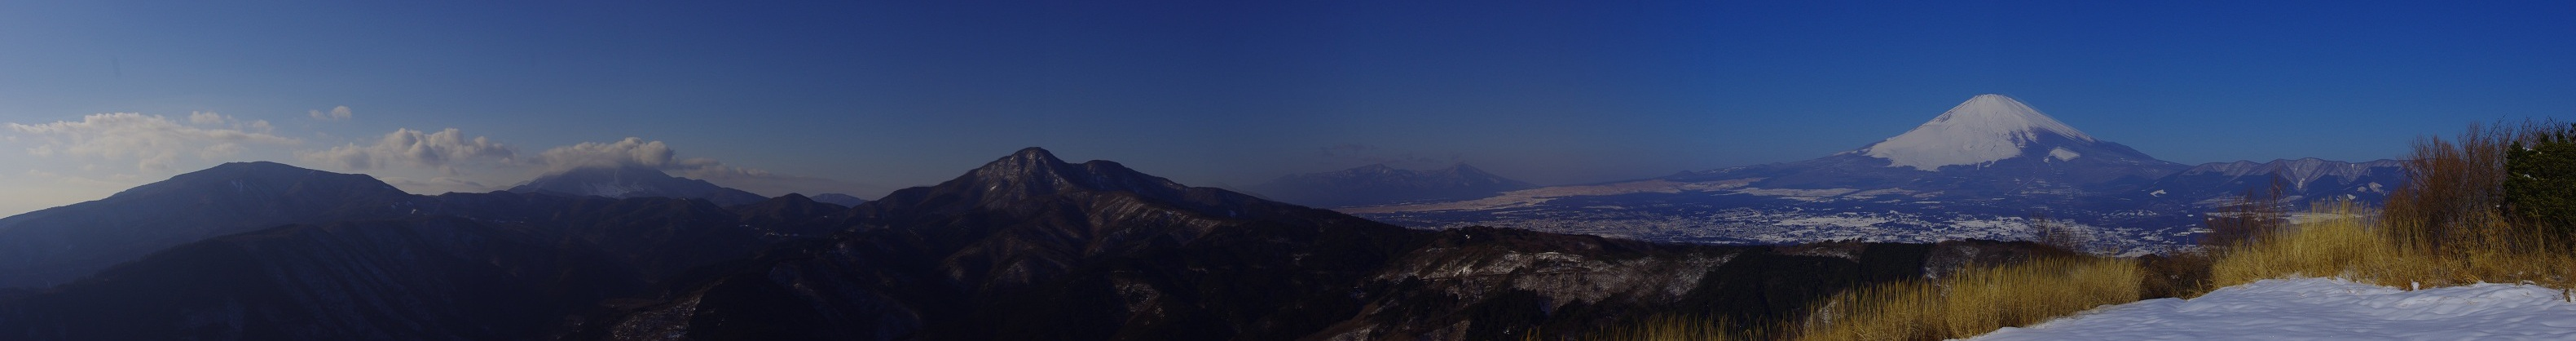 panoramaB20110116.jpg